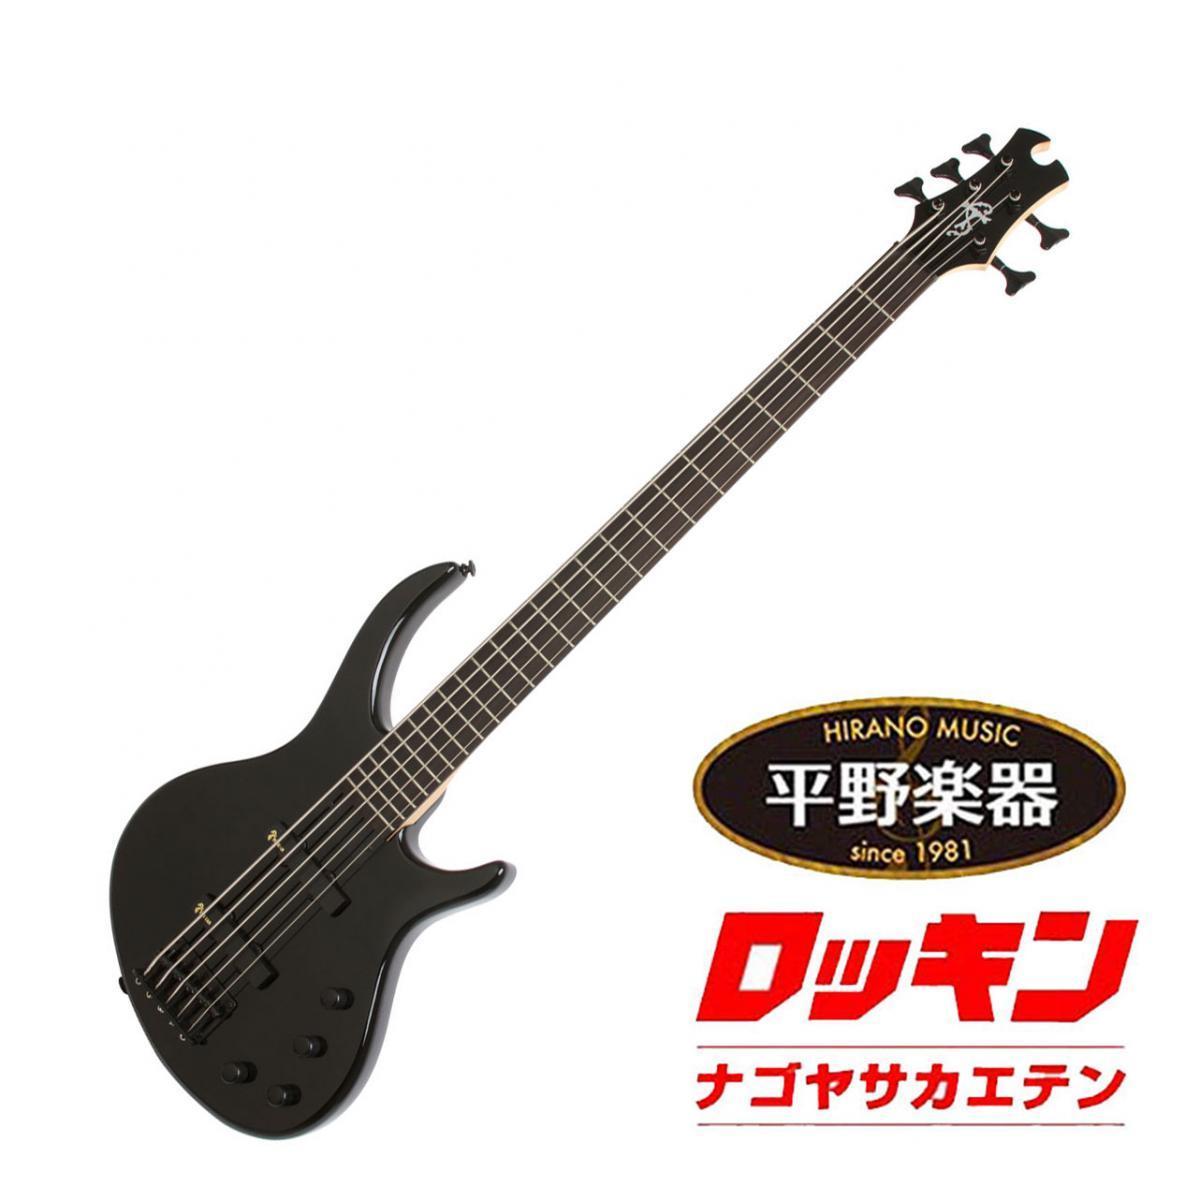 Epiphone ☆期間限定大特価!!★Toby Deluxe-V Bass Ebony